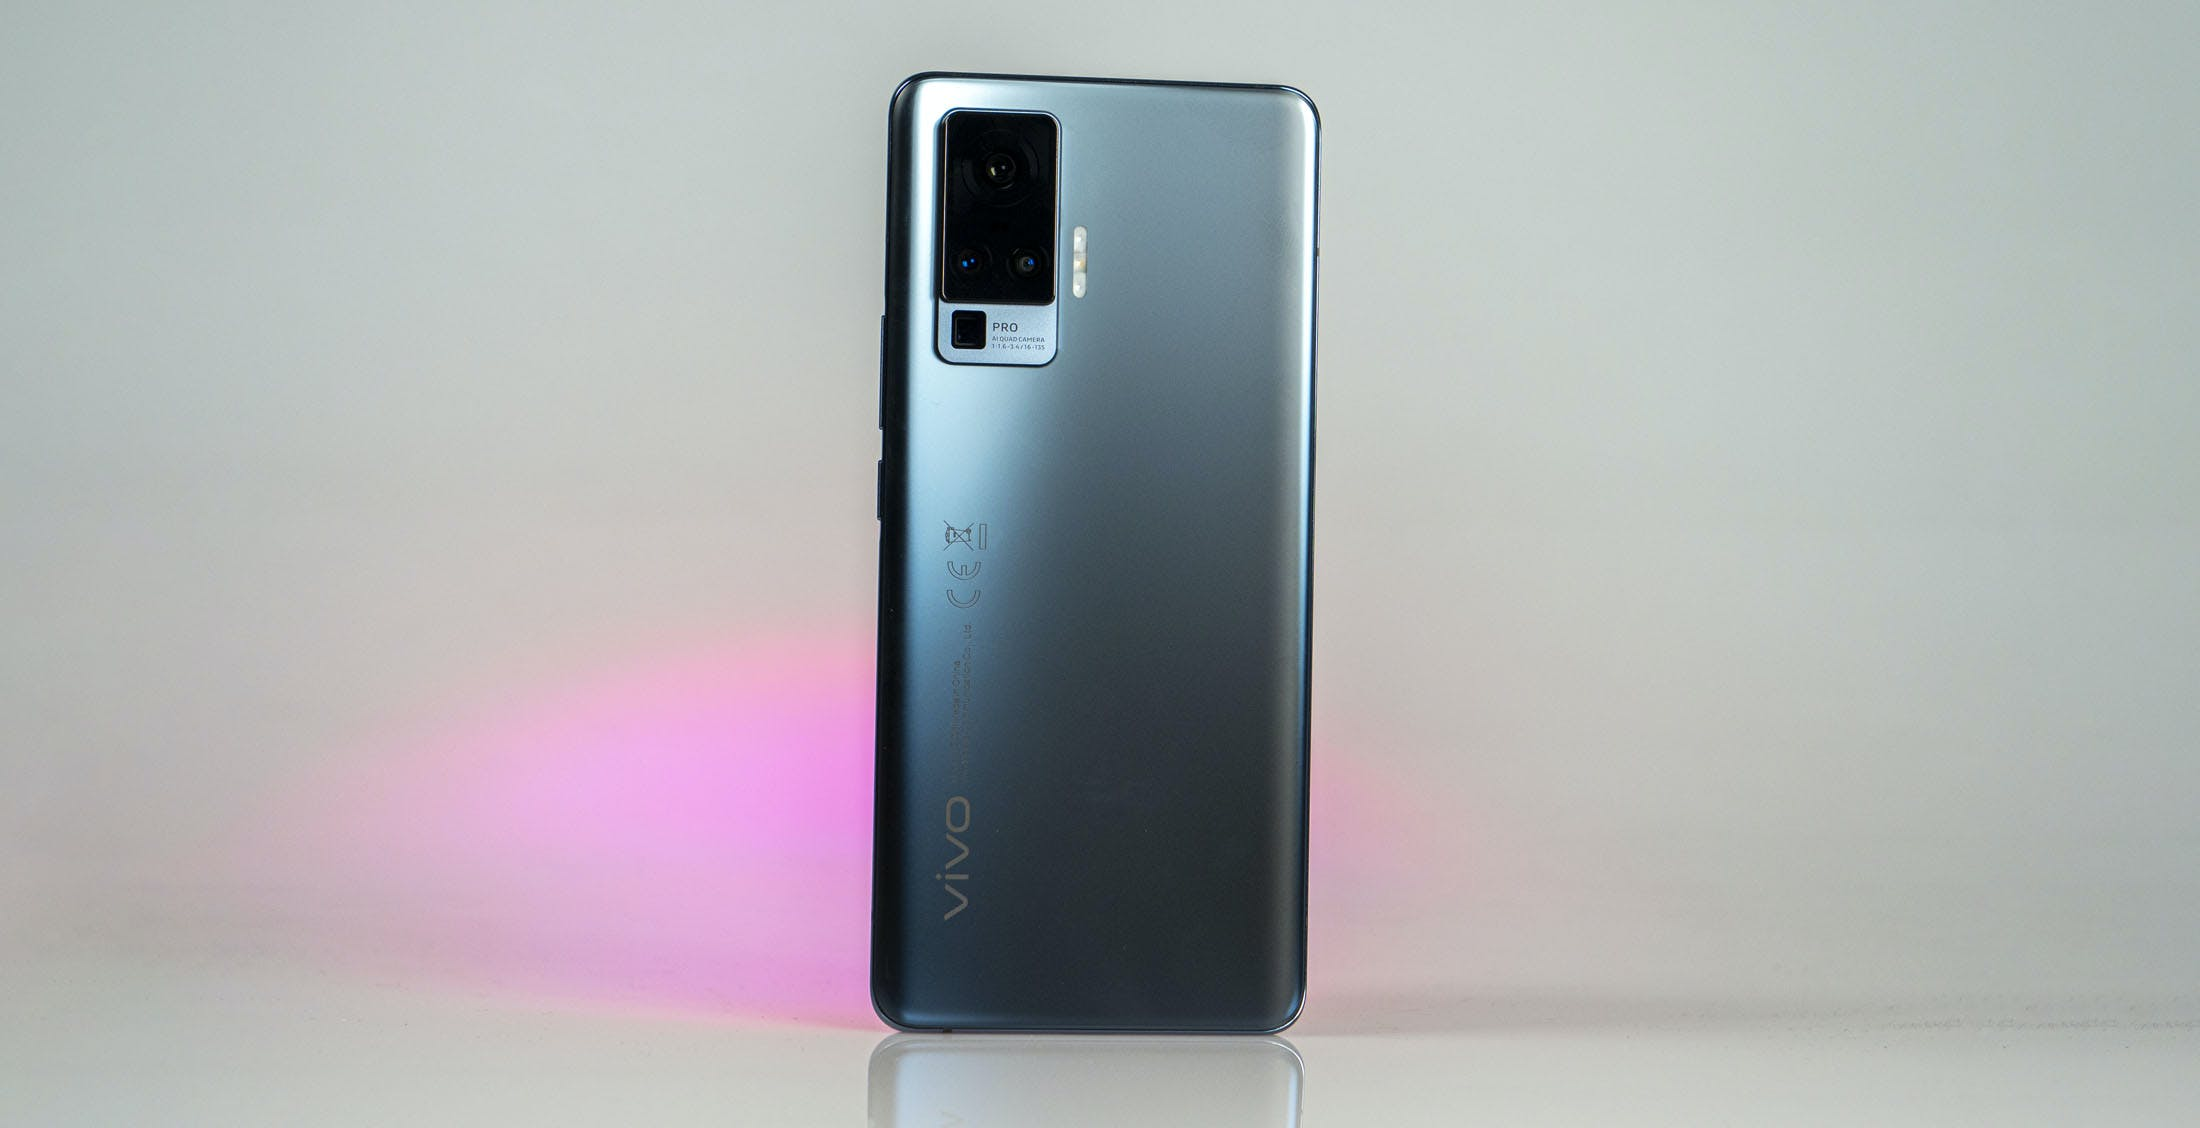 Anteprima Vivo X51 5G, debutta lo smartphone con gimbal